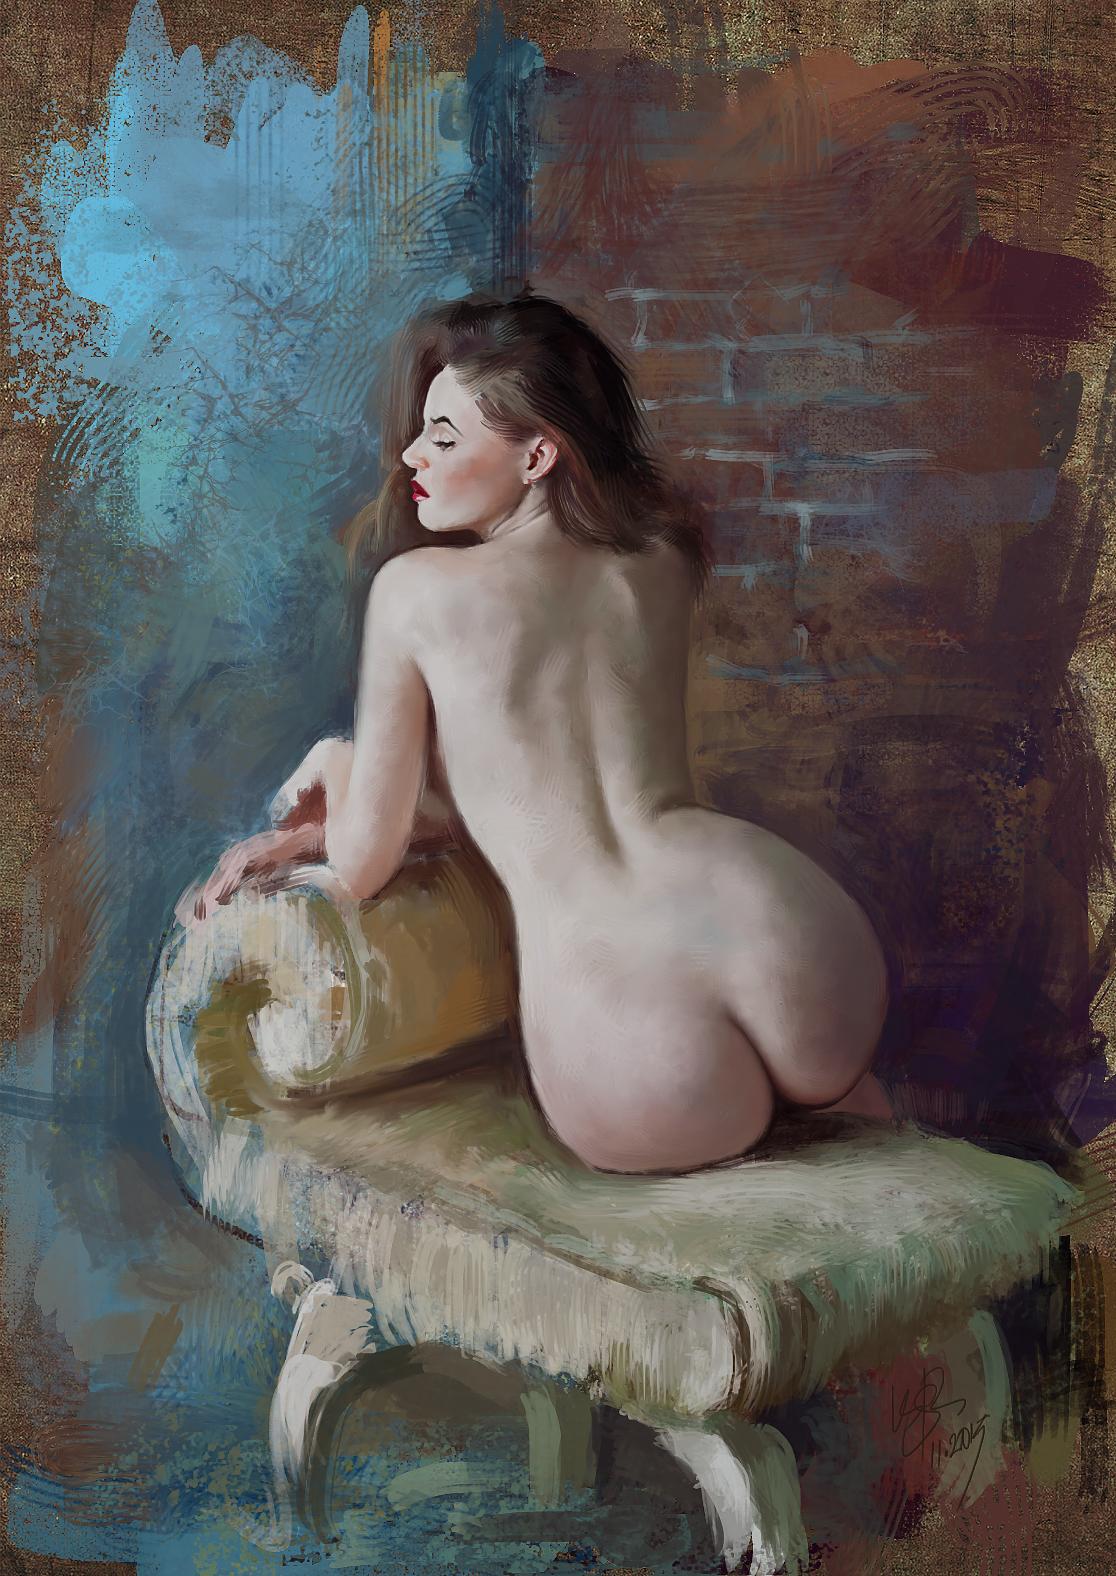 Naked paint artist